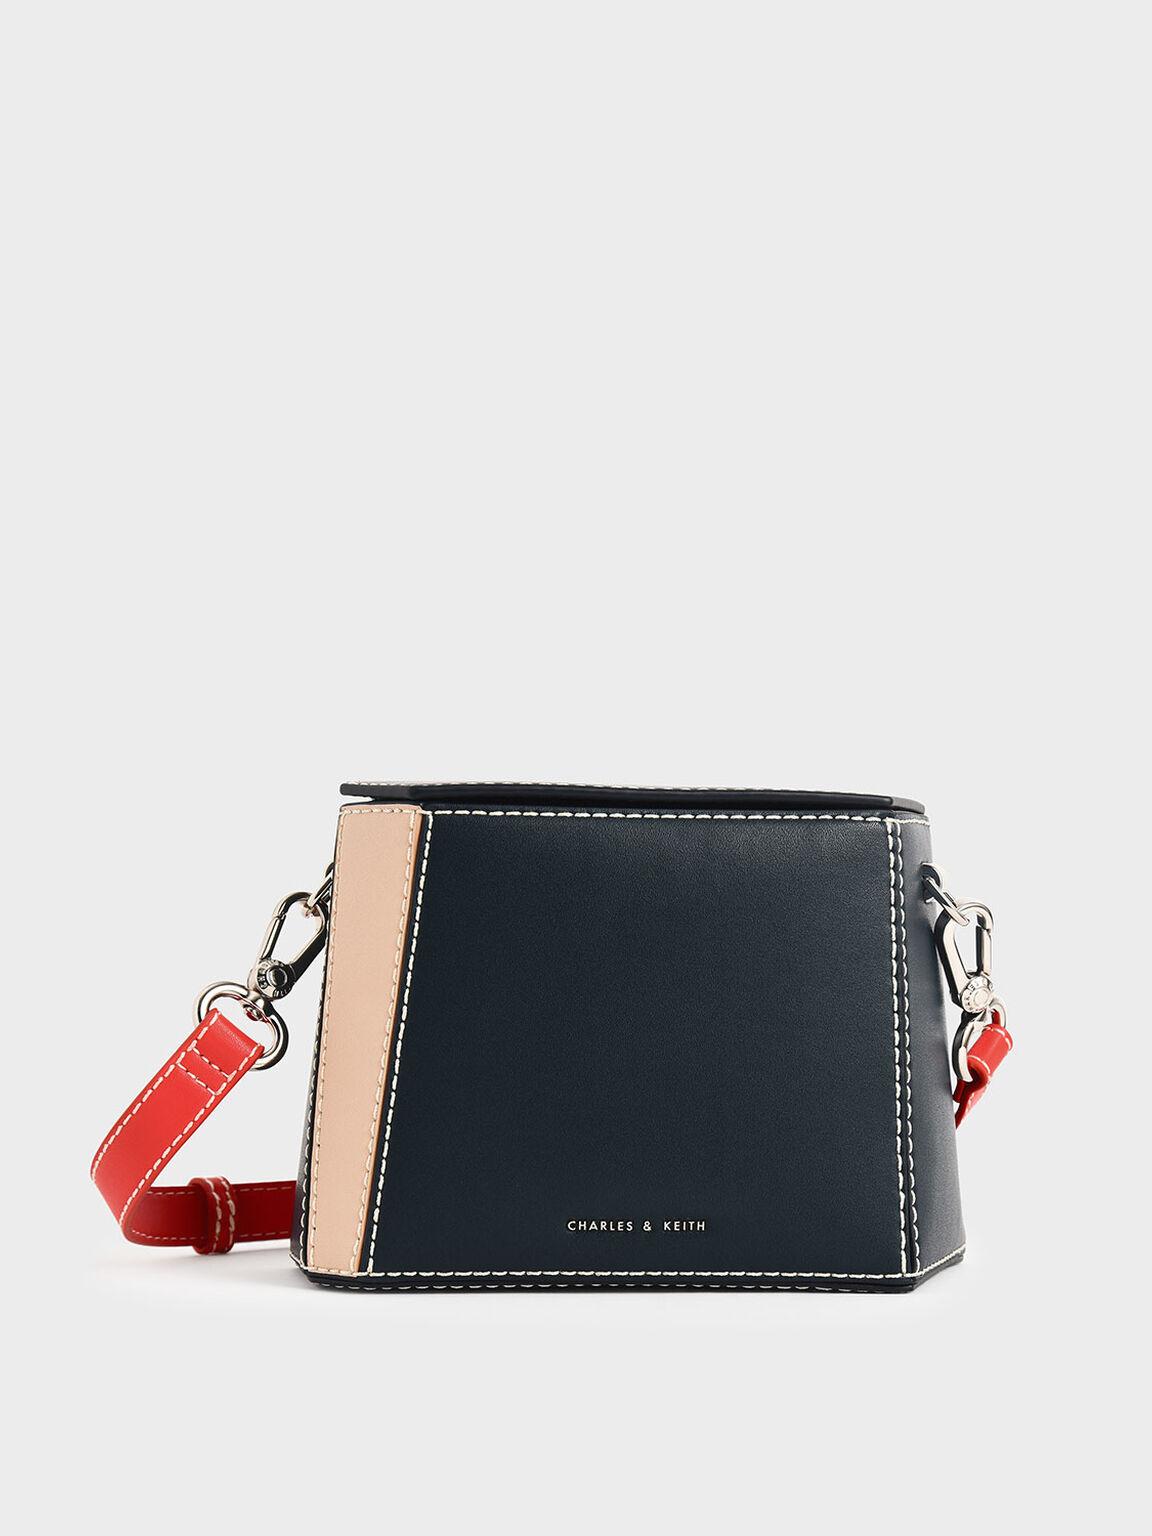 Two-Tone Boxy Bag, Teal, hi-res